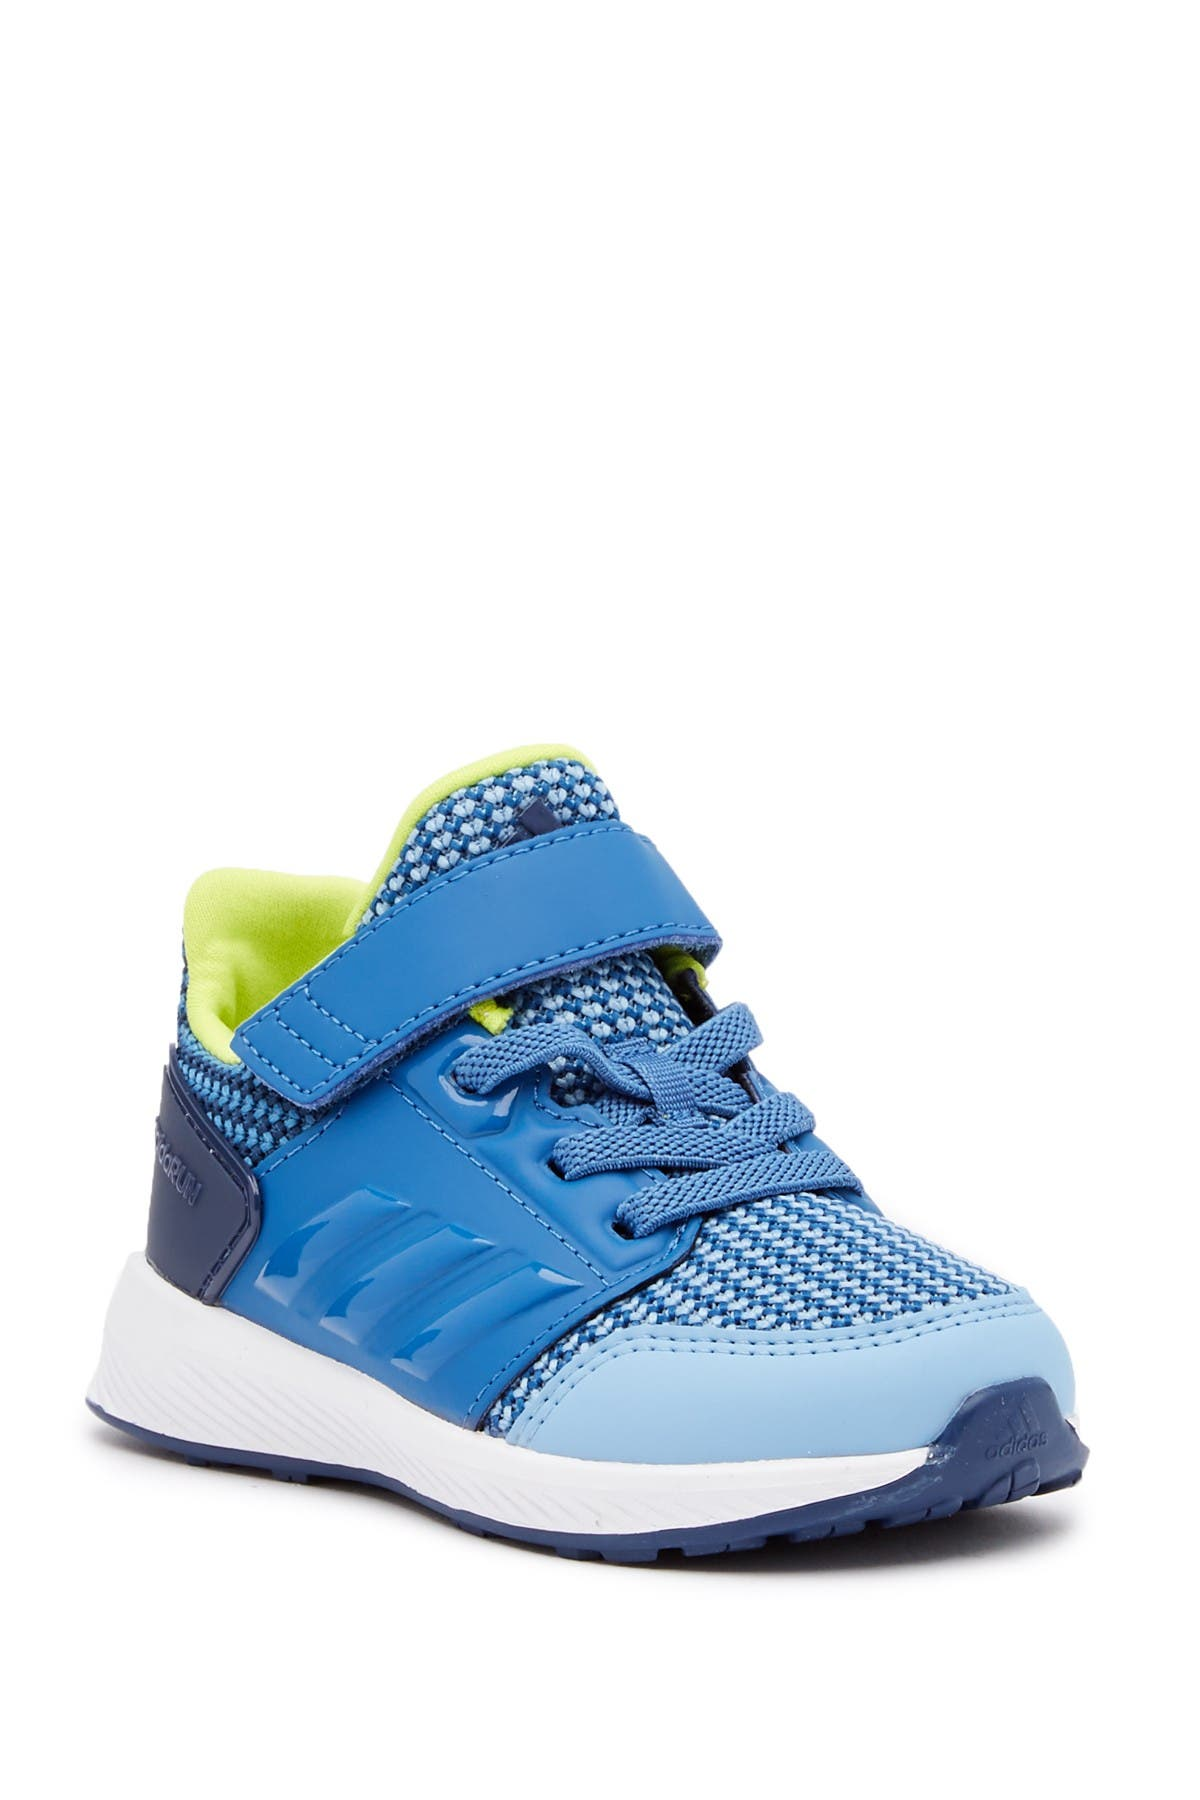 adidas | Rapida Run Shoes | Nordstrom Rack